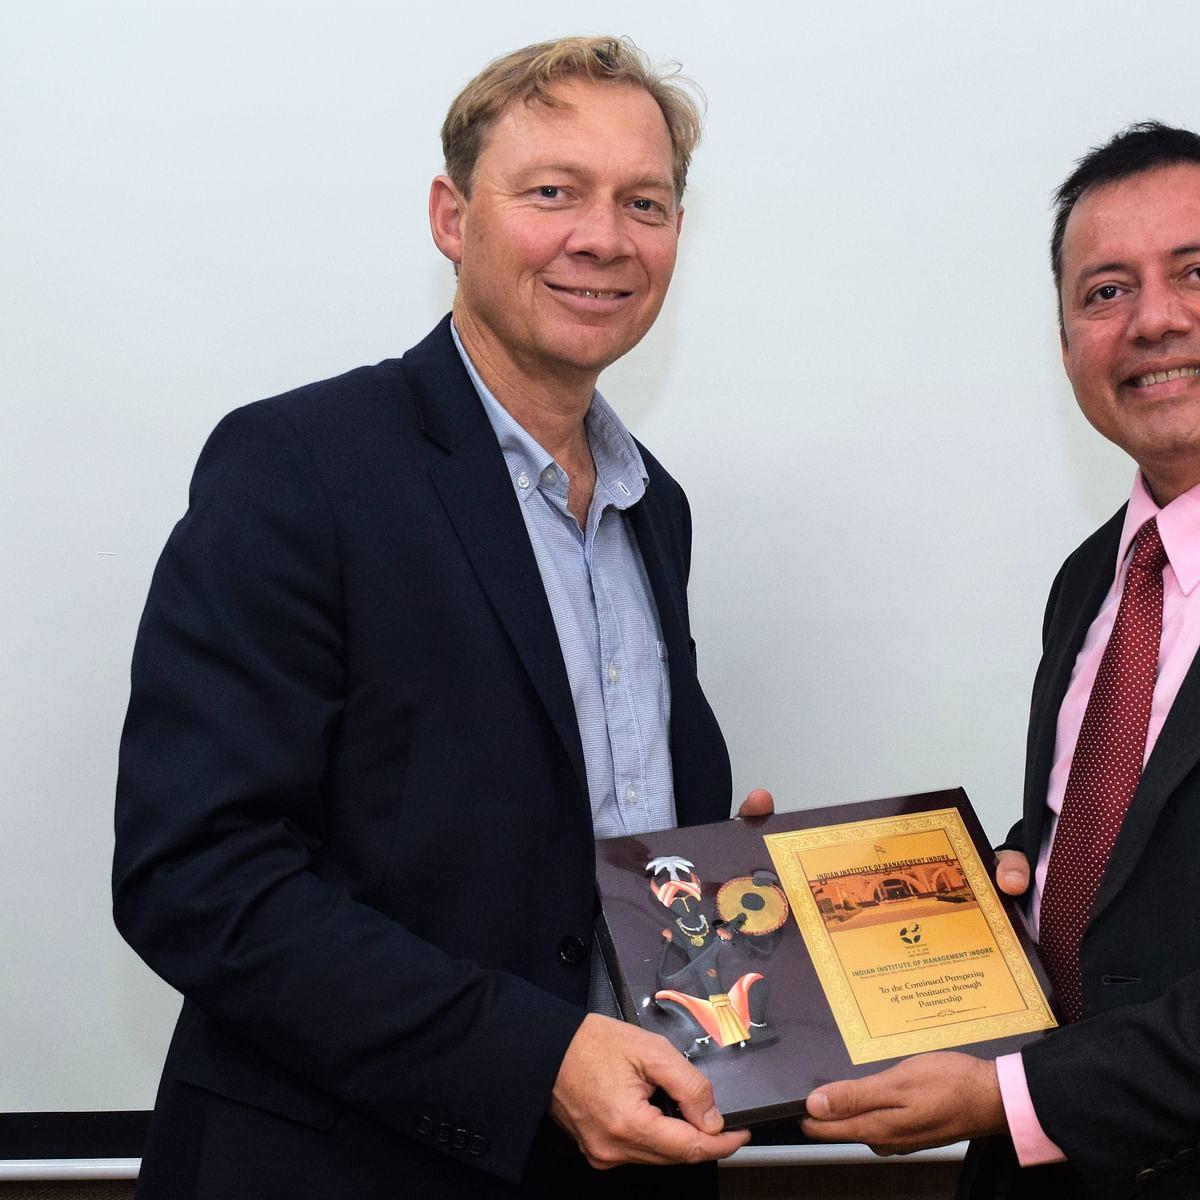 IIM Indore signs MoU with University of Queensland